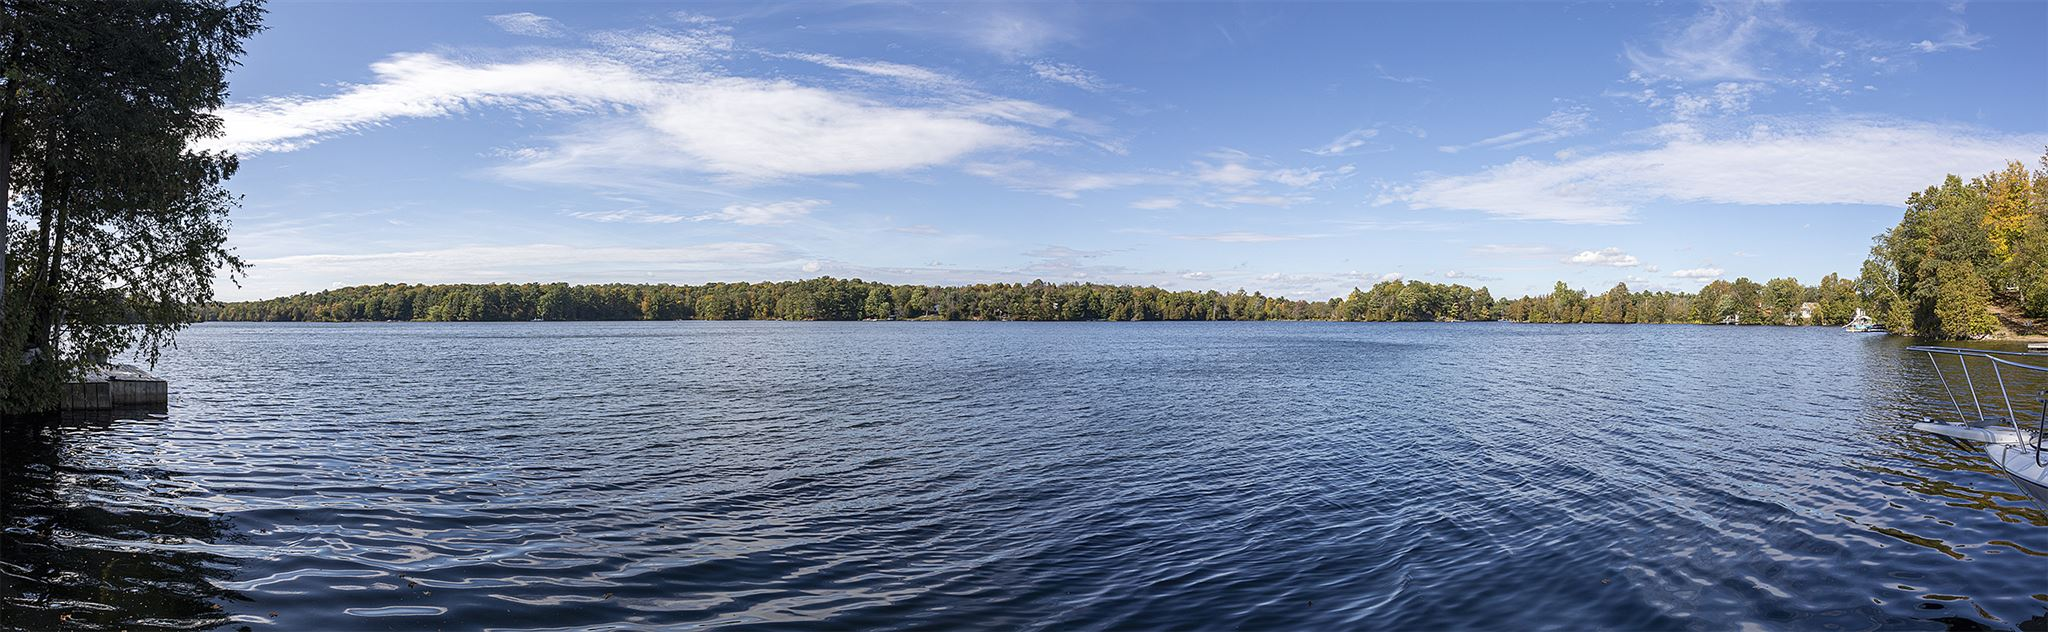 817 Allina Lane, Seeley's Bay, Ontario (ID K19006326)